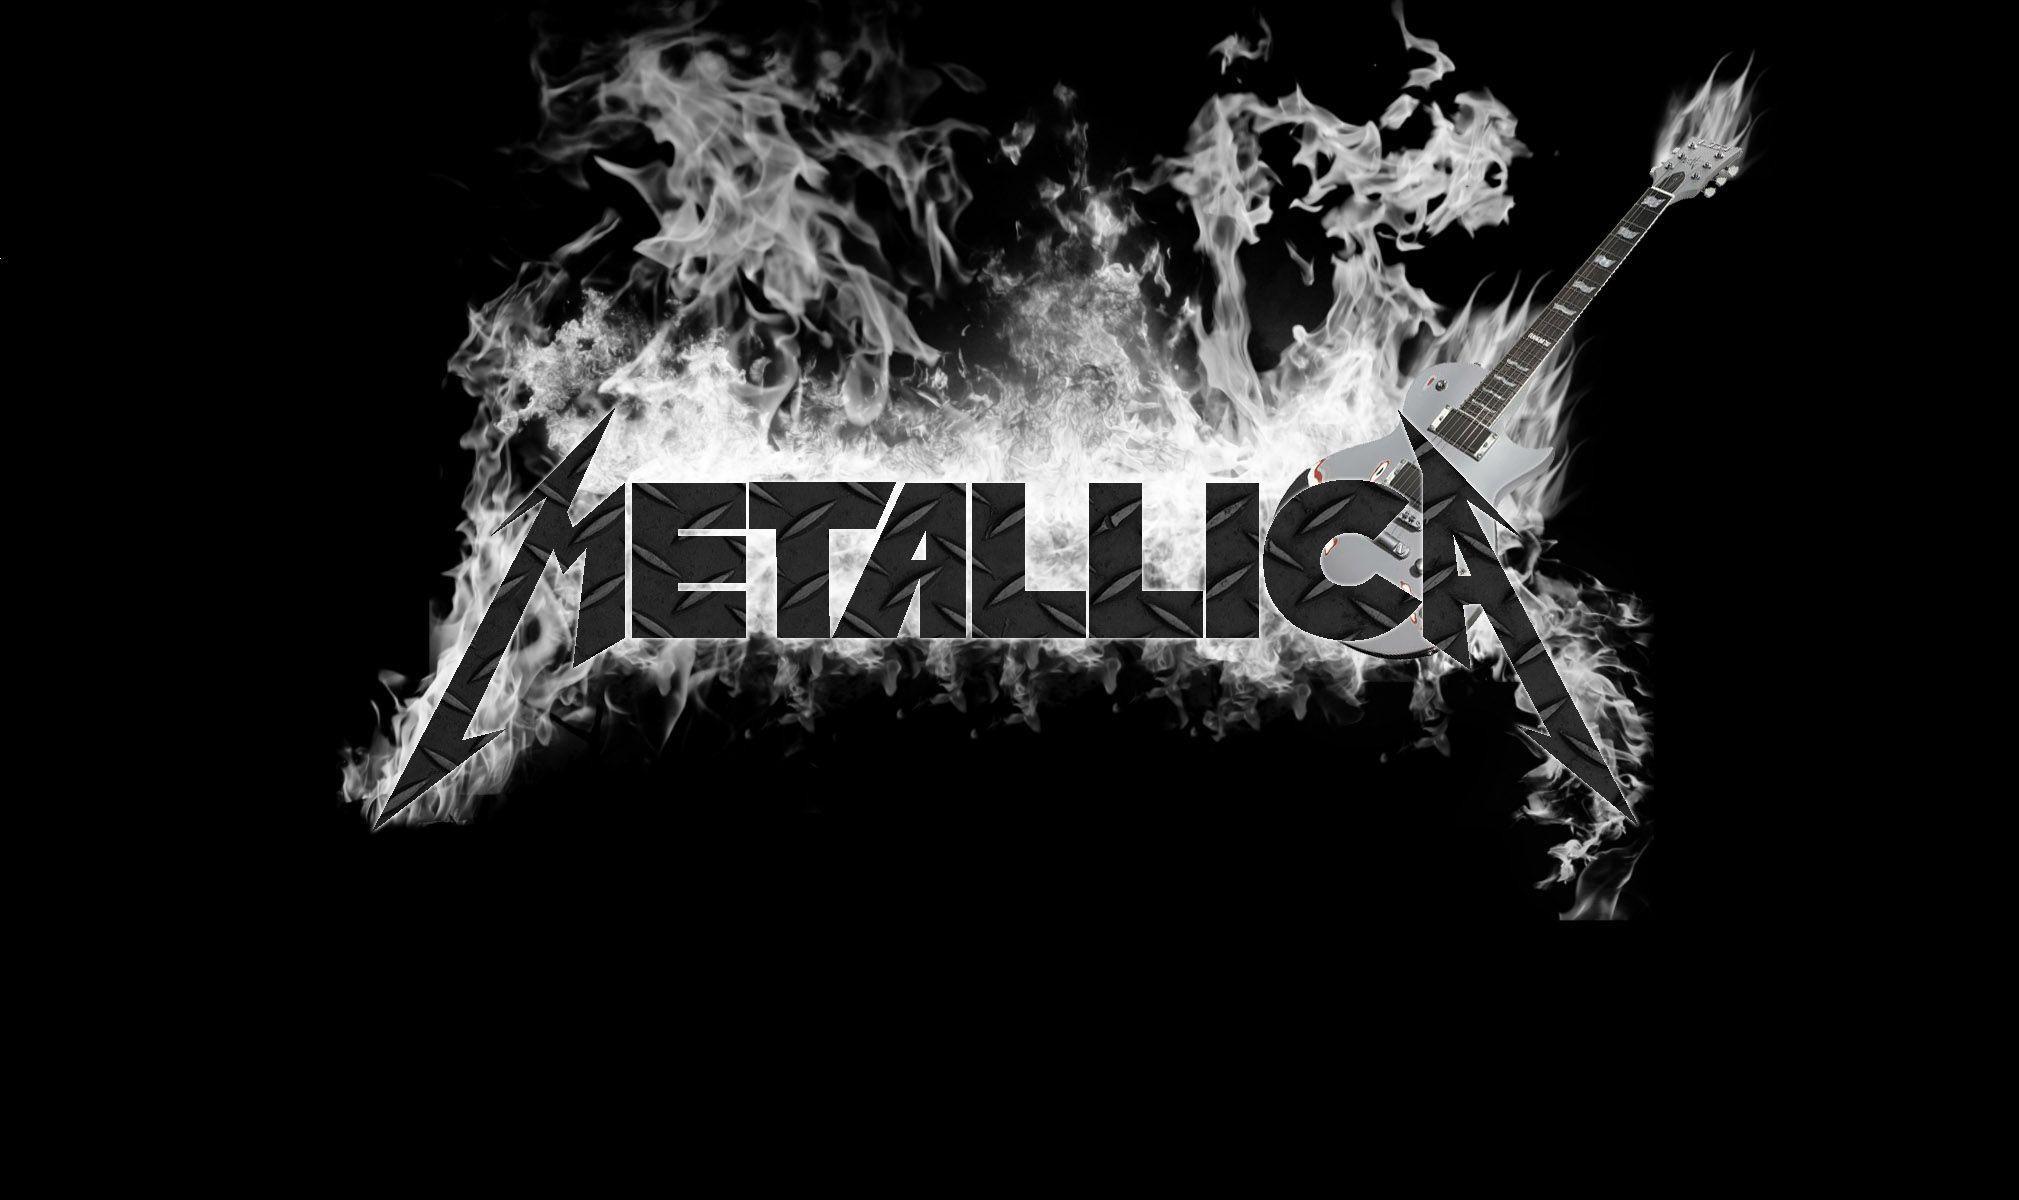 Metallica Logo Wallpaper Wallpapertag